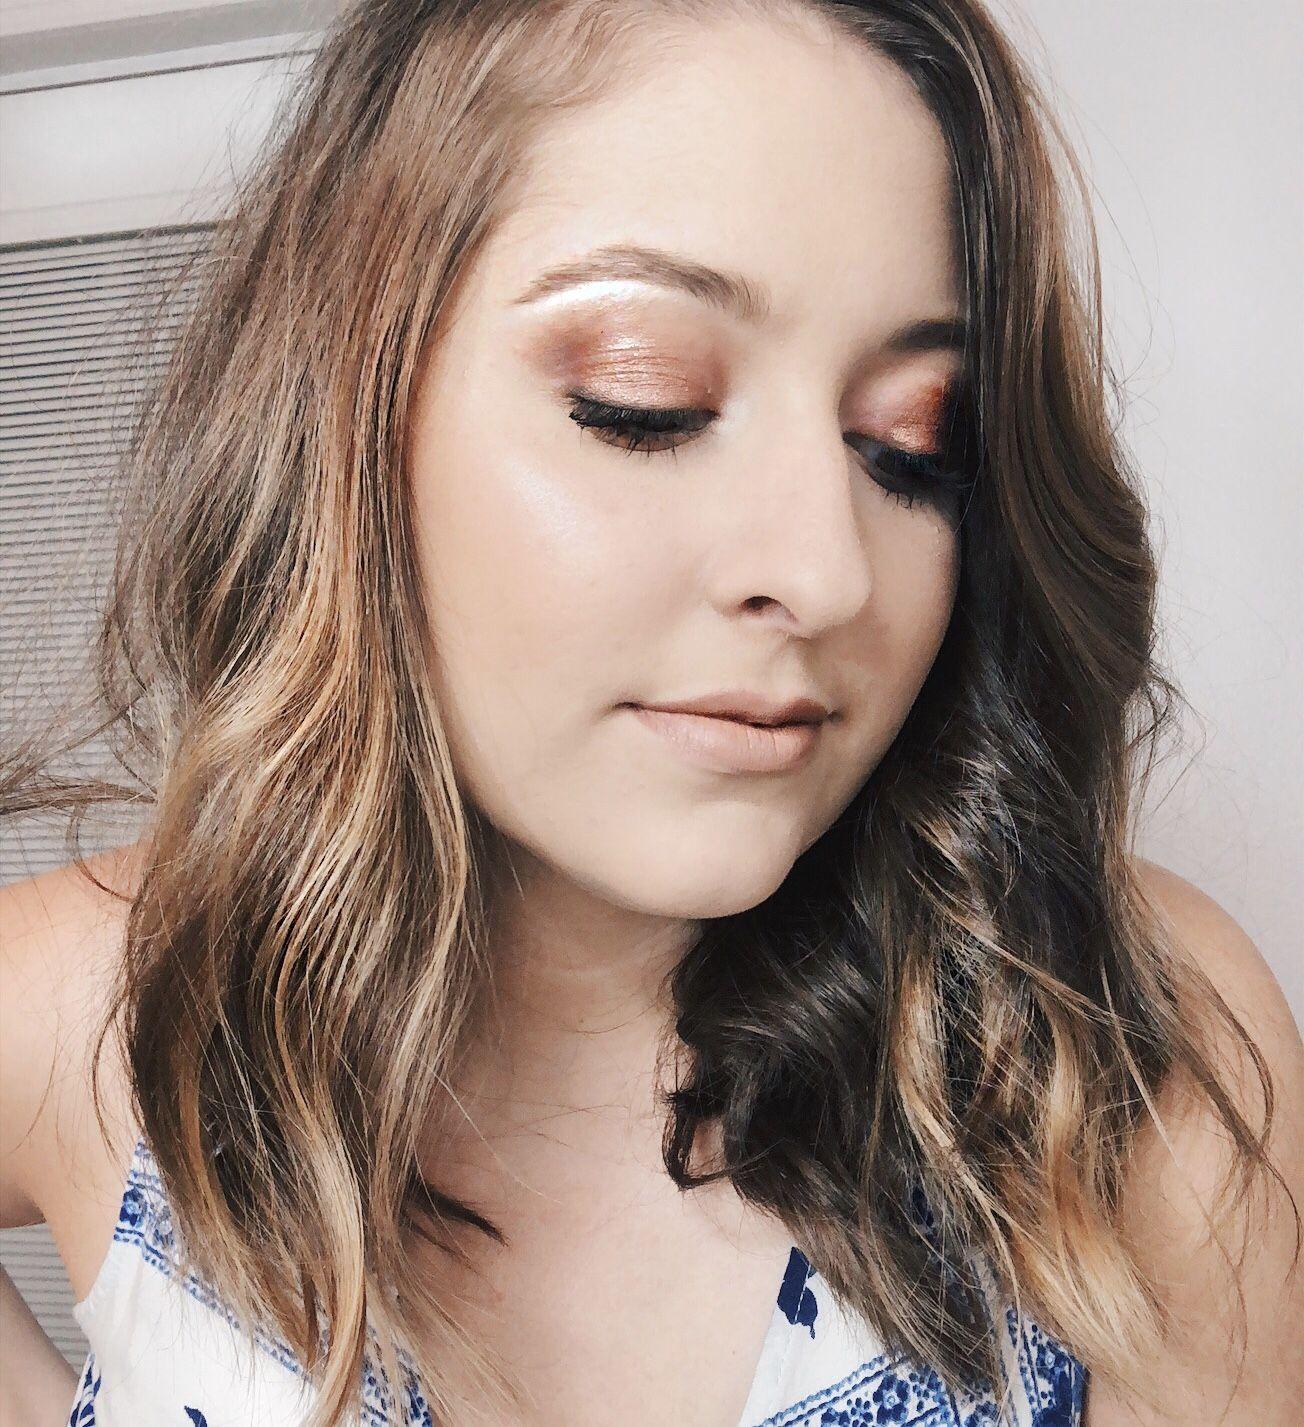 Date Night Makeup Copper Smokey Eye Tutorial Date night